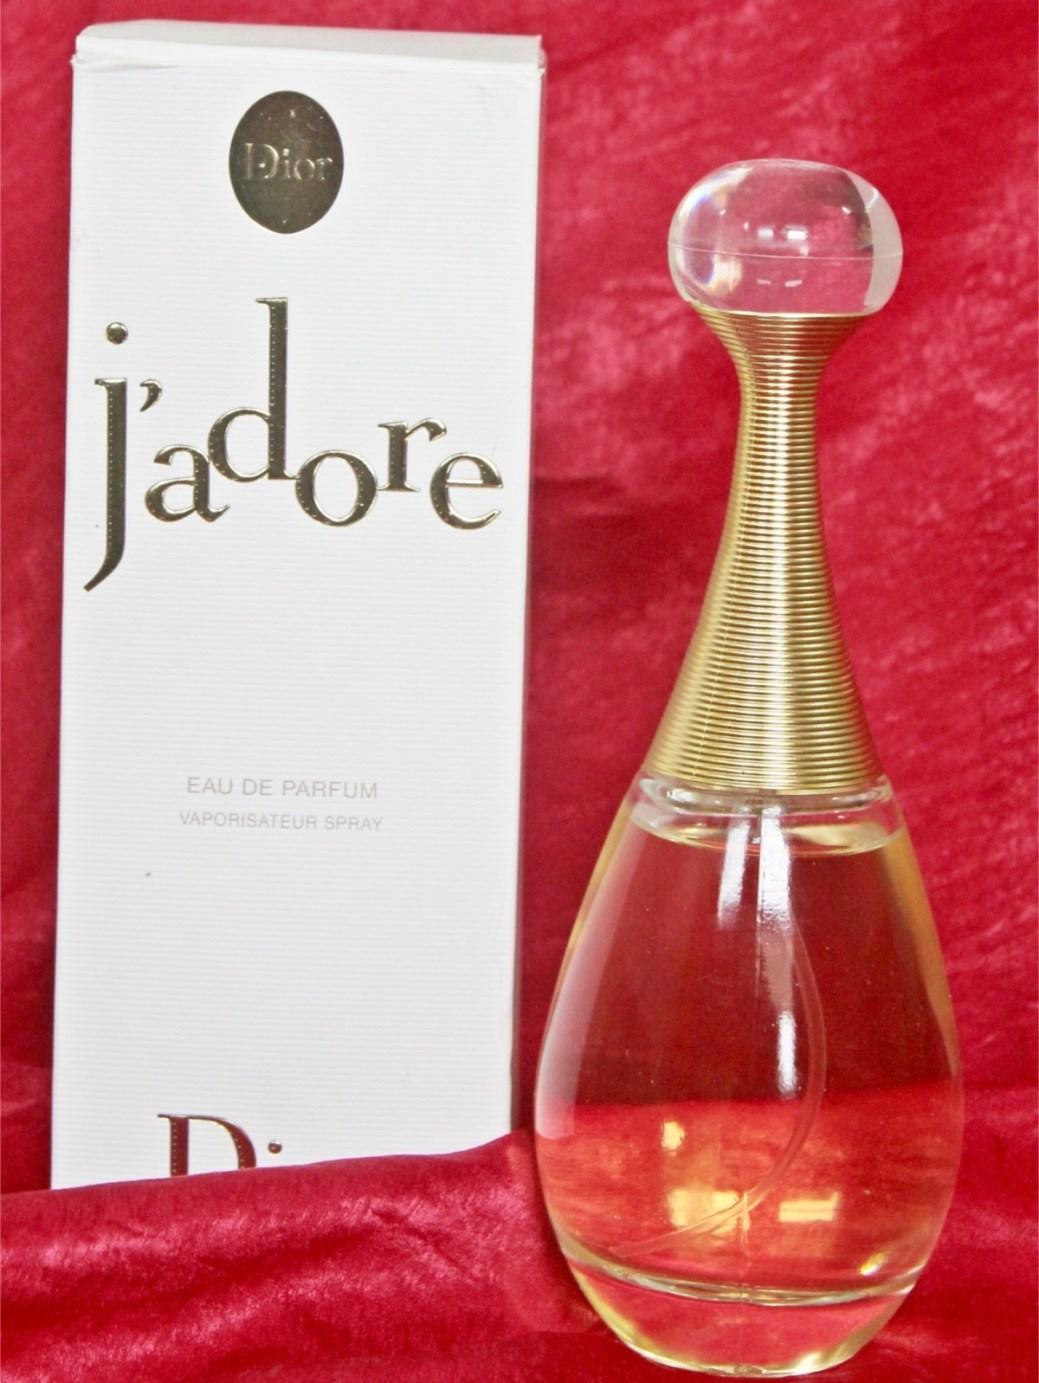 Dior Jadore Eau De Parfum Review